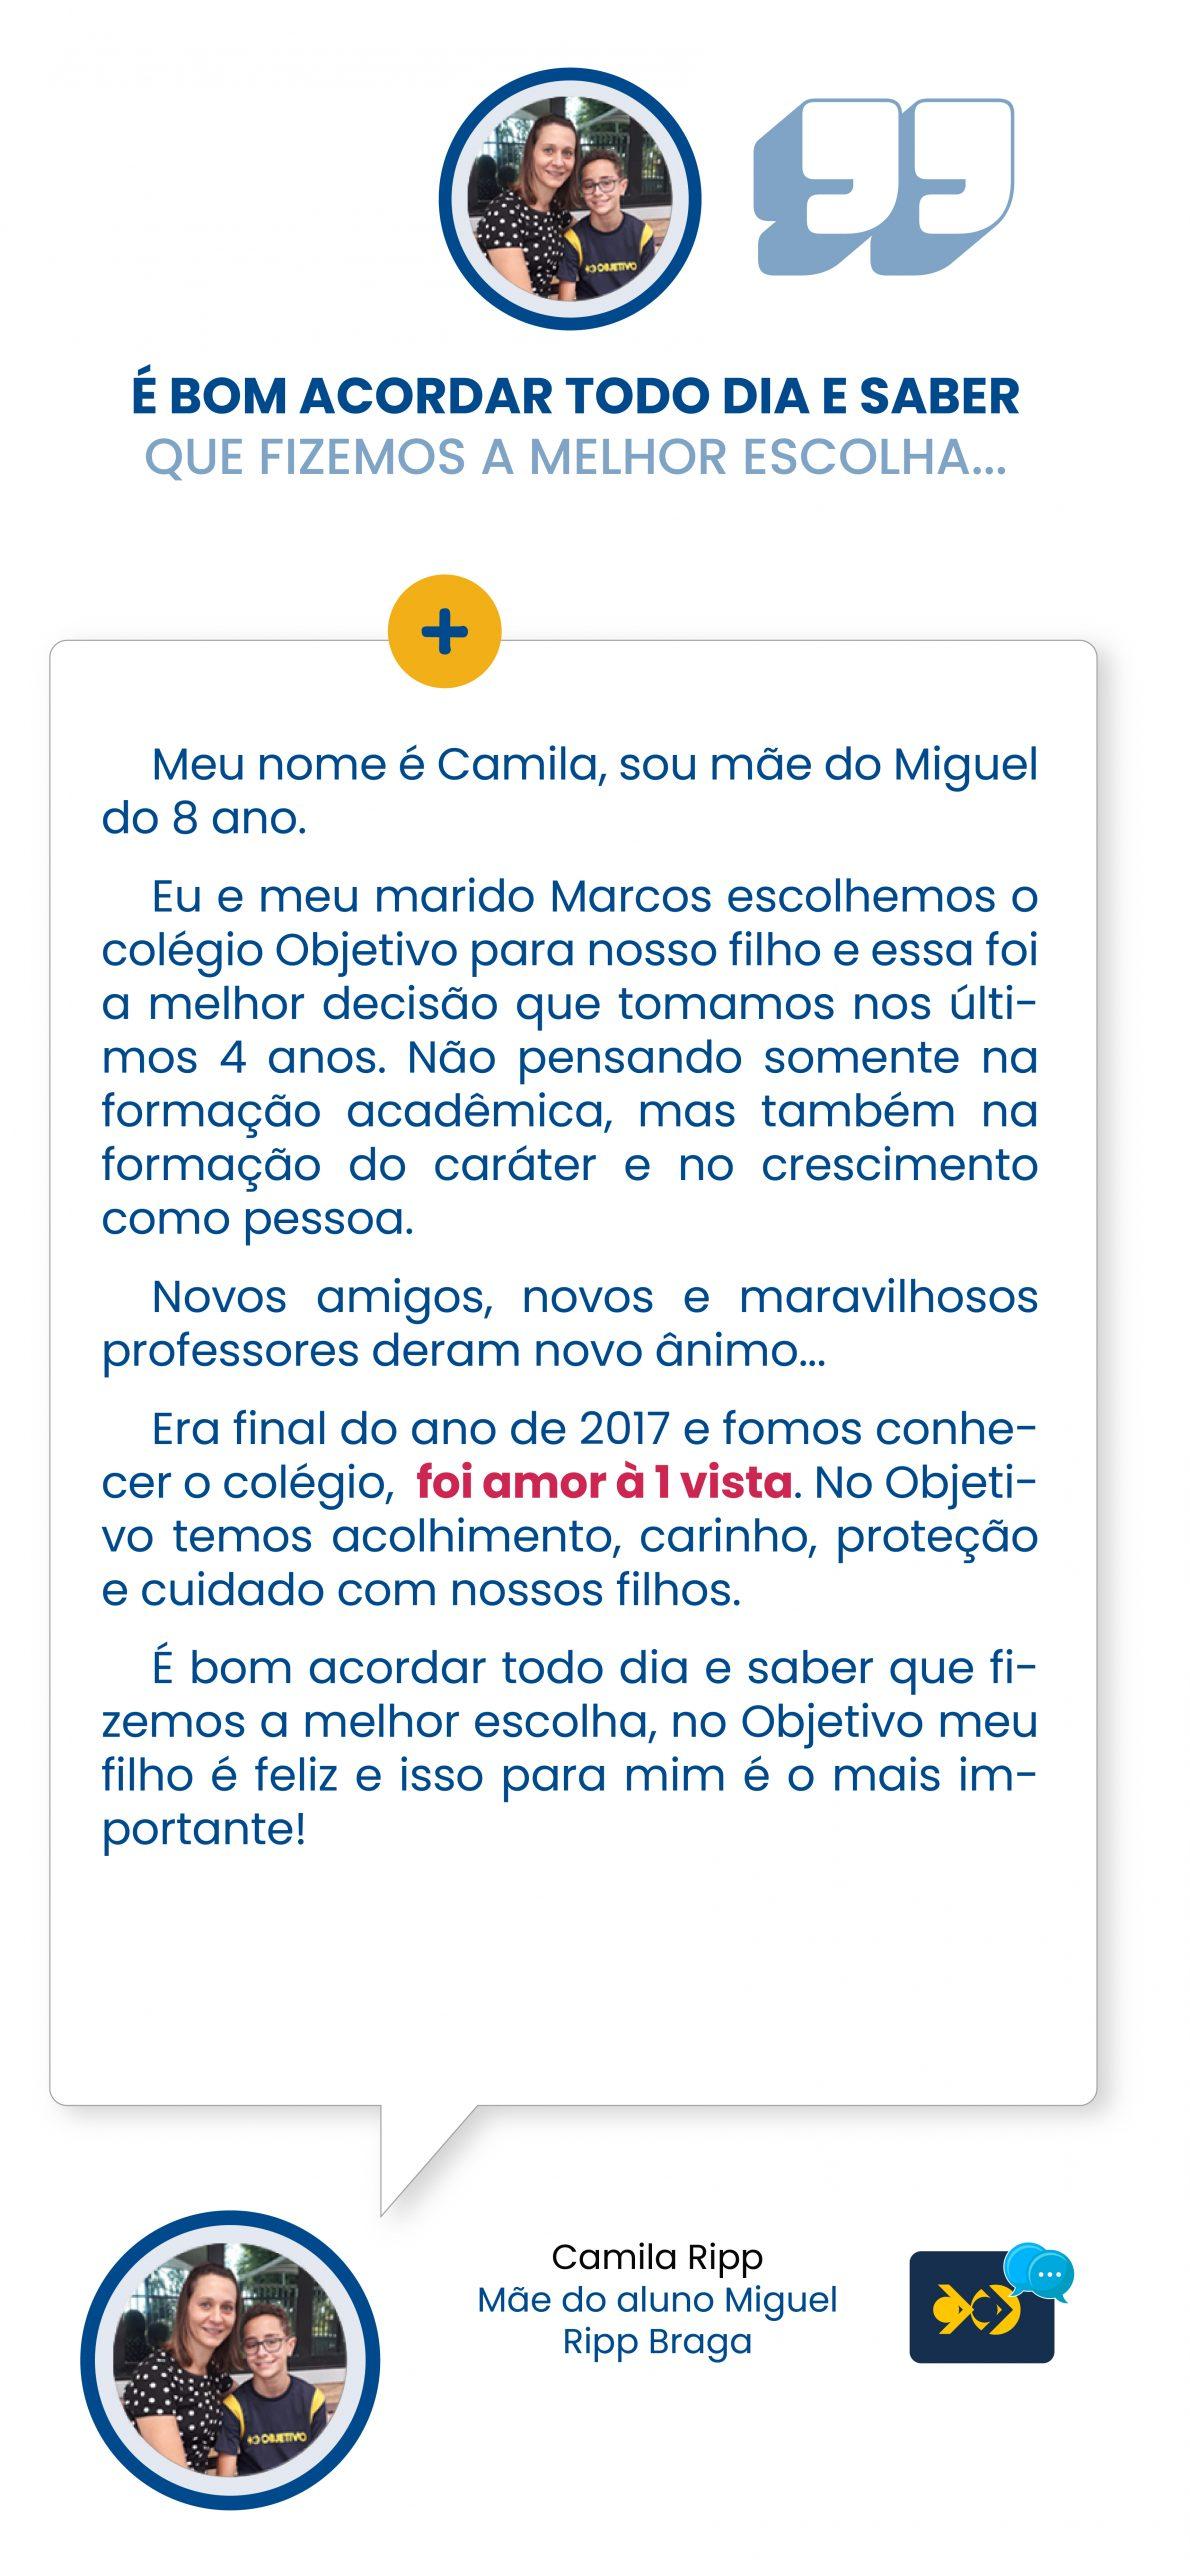 Camila Ripp - Phone